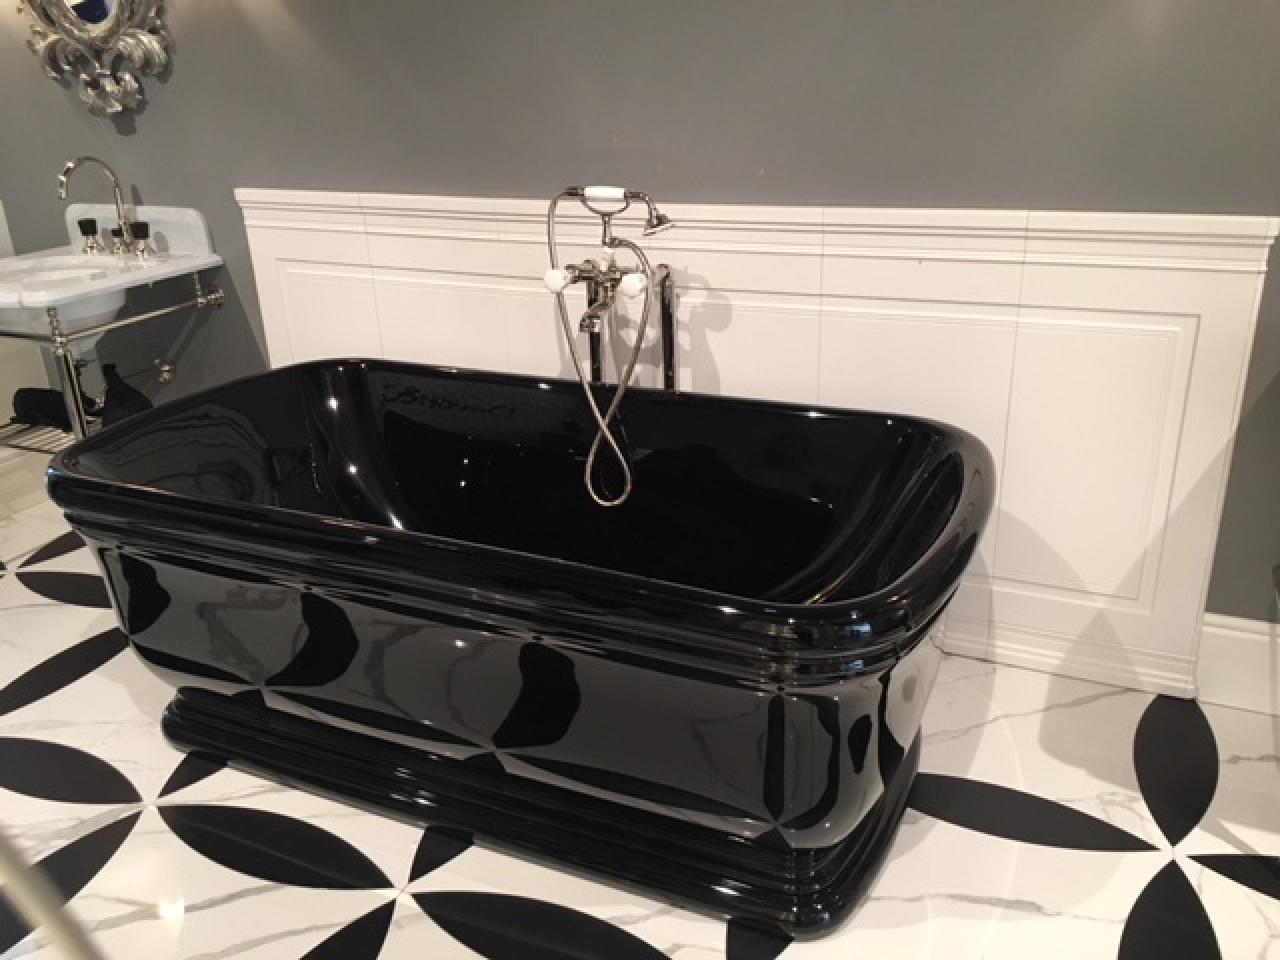 Vasche Da Bagno In Francese : Boiserie in ceramica nel bagno moderno fratelli pellizzari